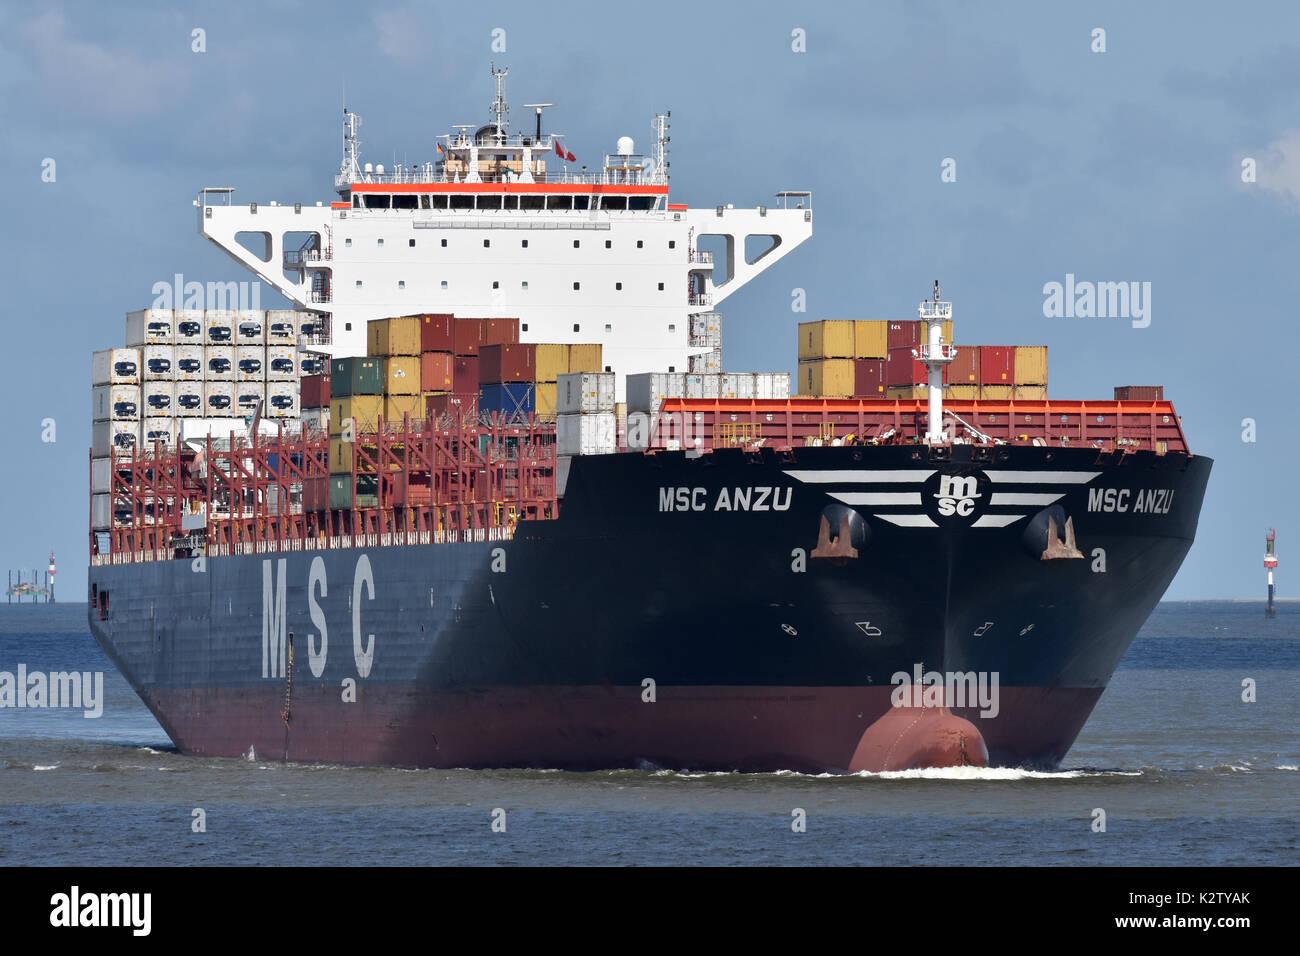 MSC Anzu - Stock Image